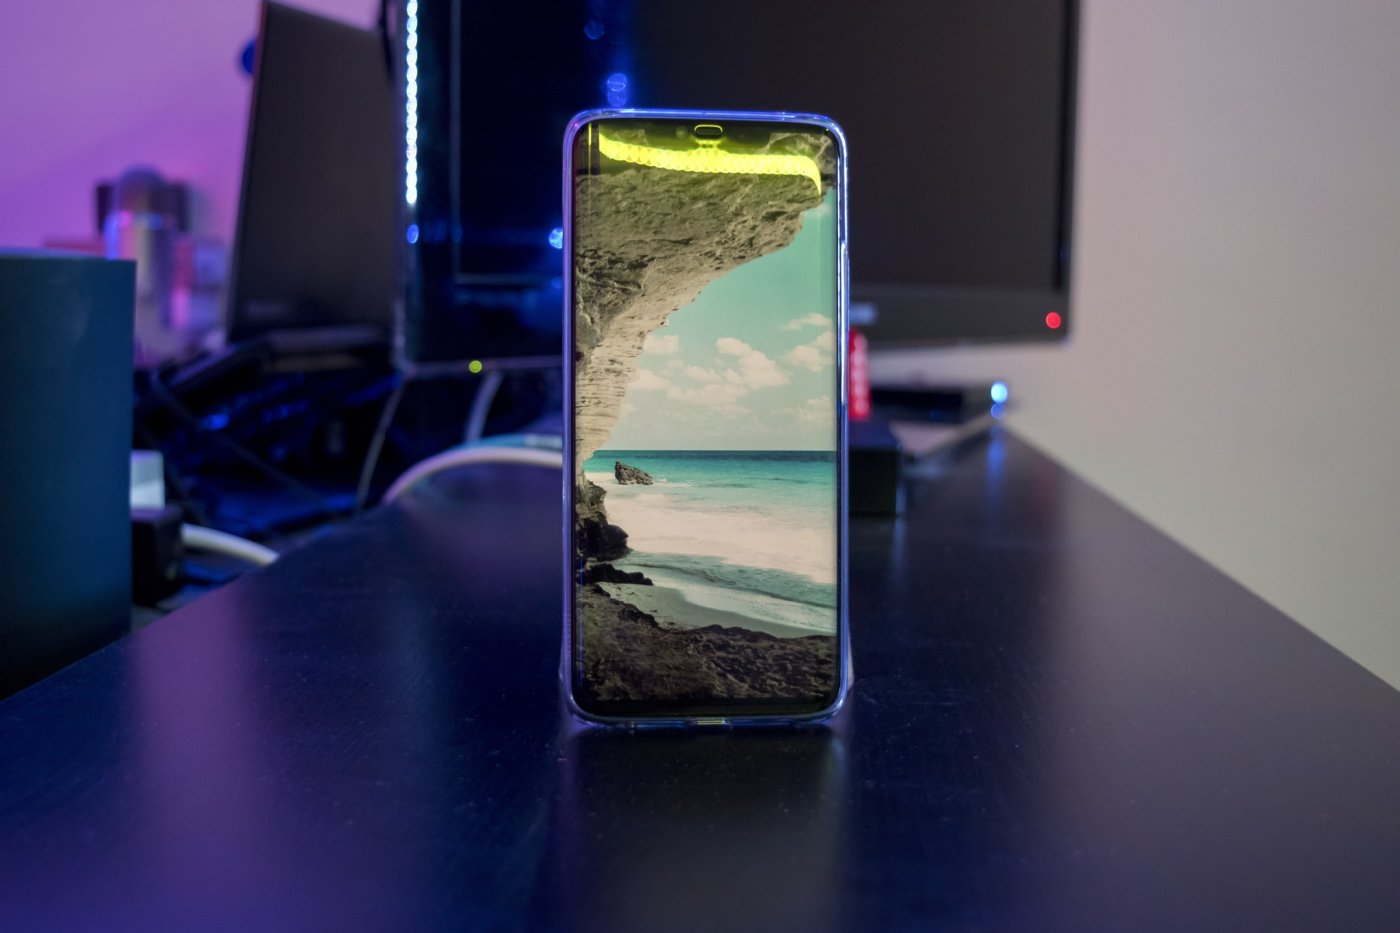 Huawei Mate 20 Pro review by Martin Guay